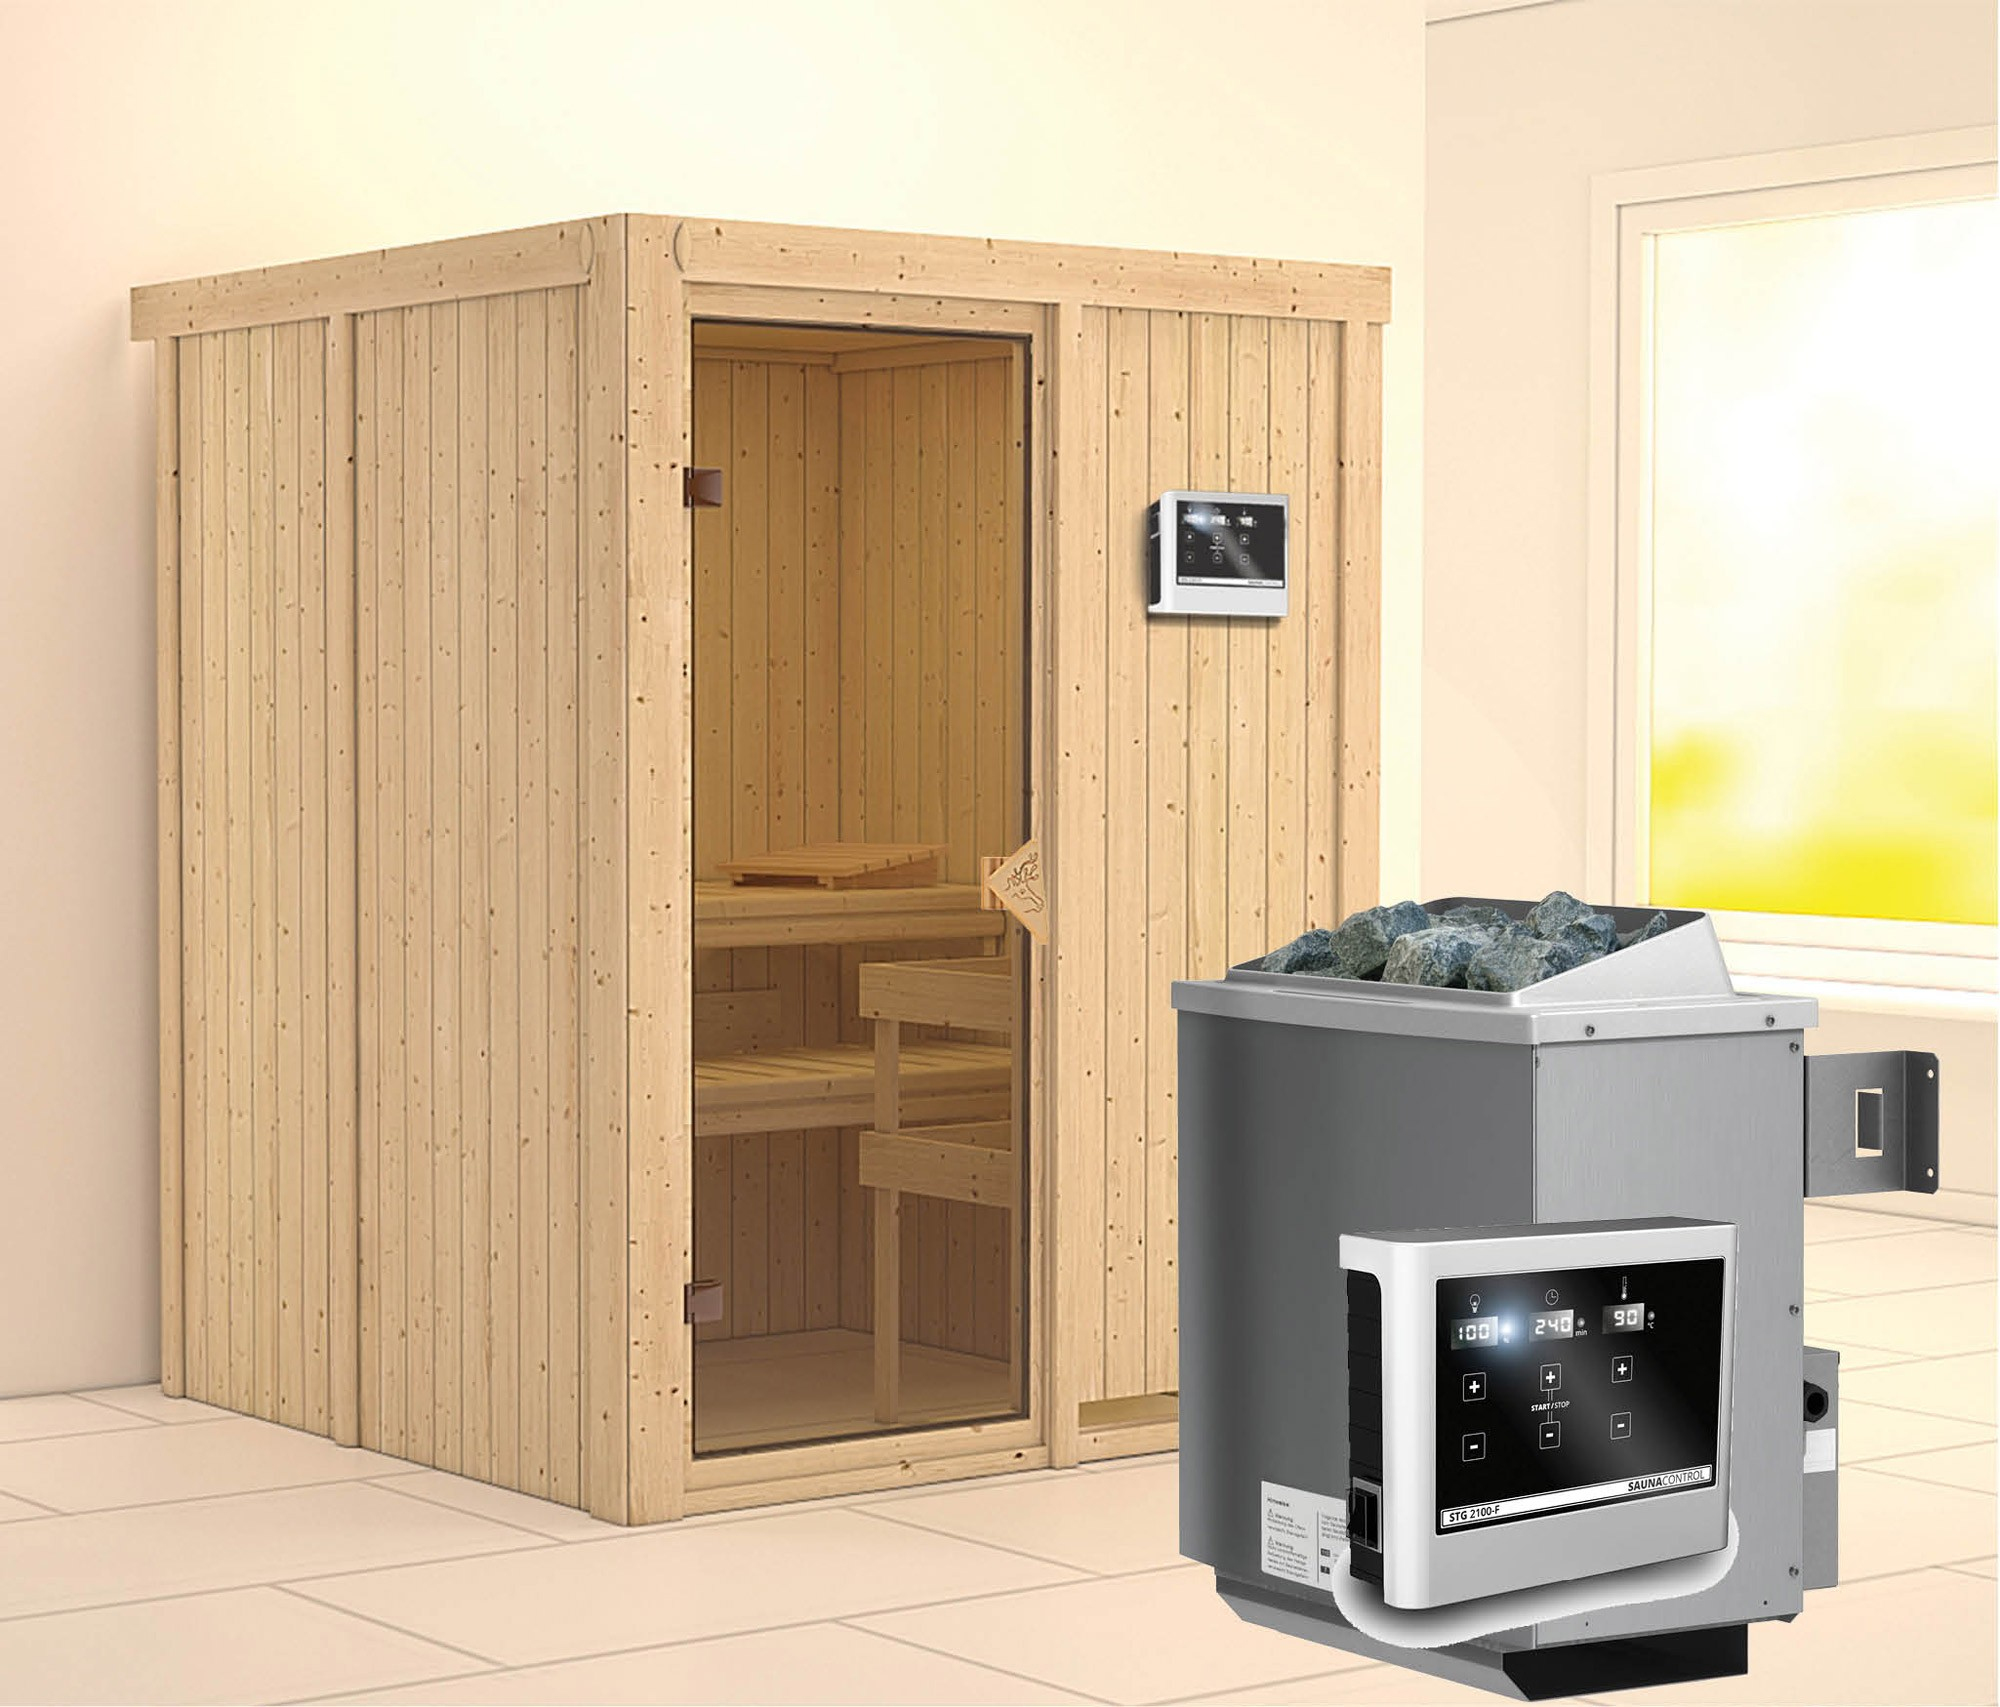 Karibu Sauna Norin 68mm mit Saunaofen 9kW extern classic Tür Bild 1